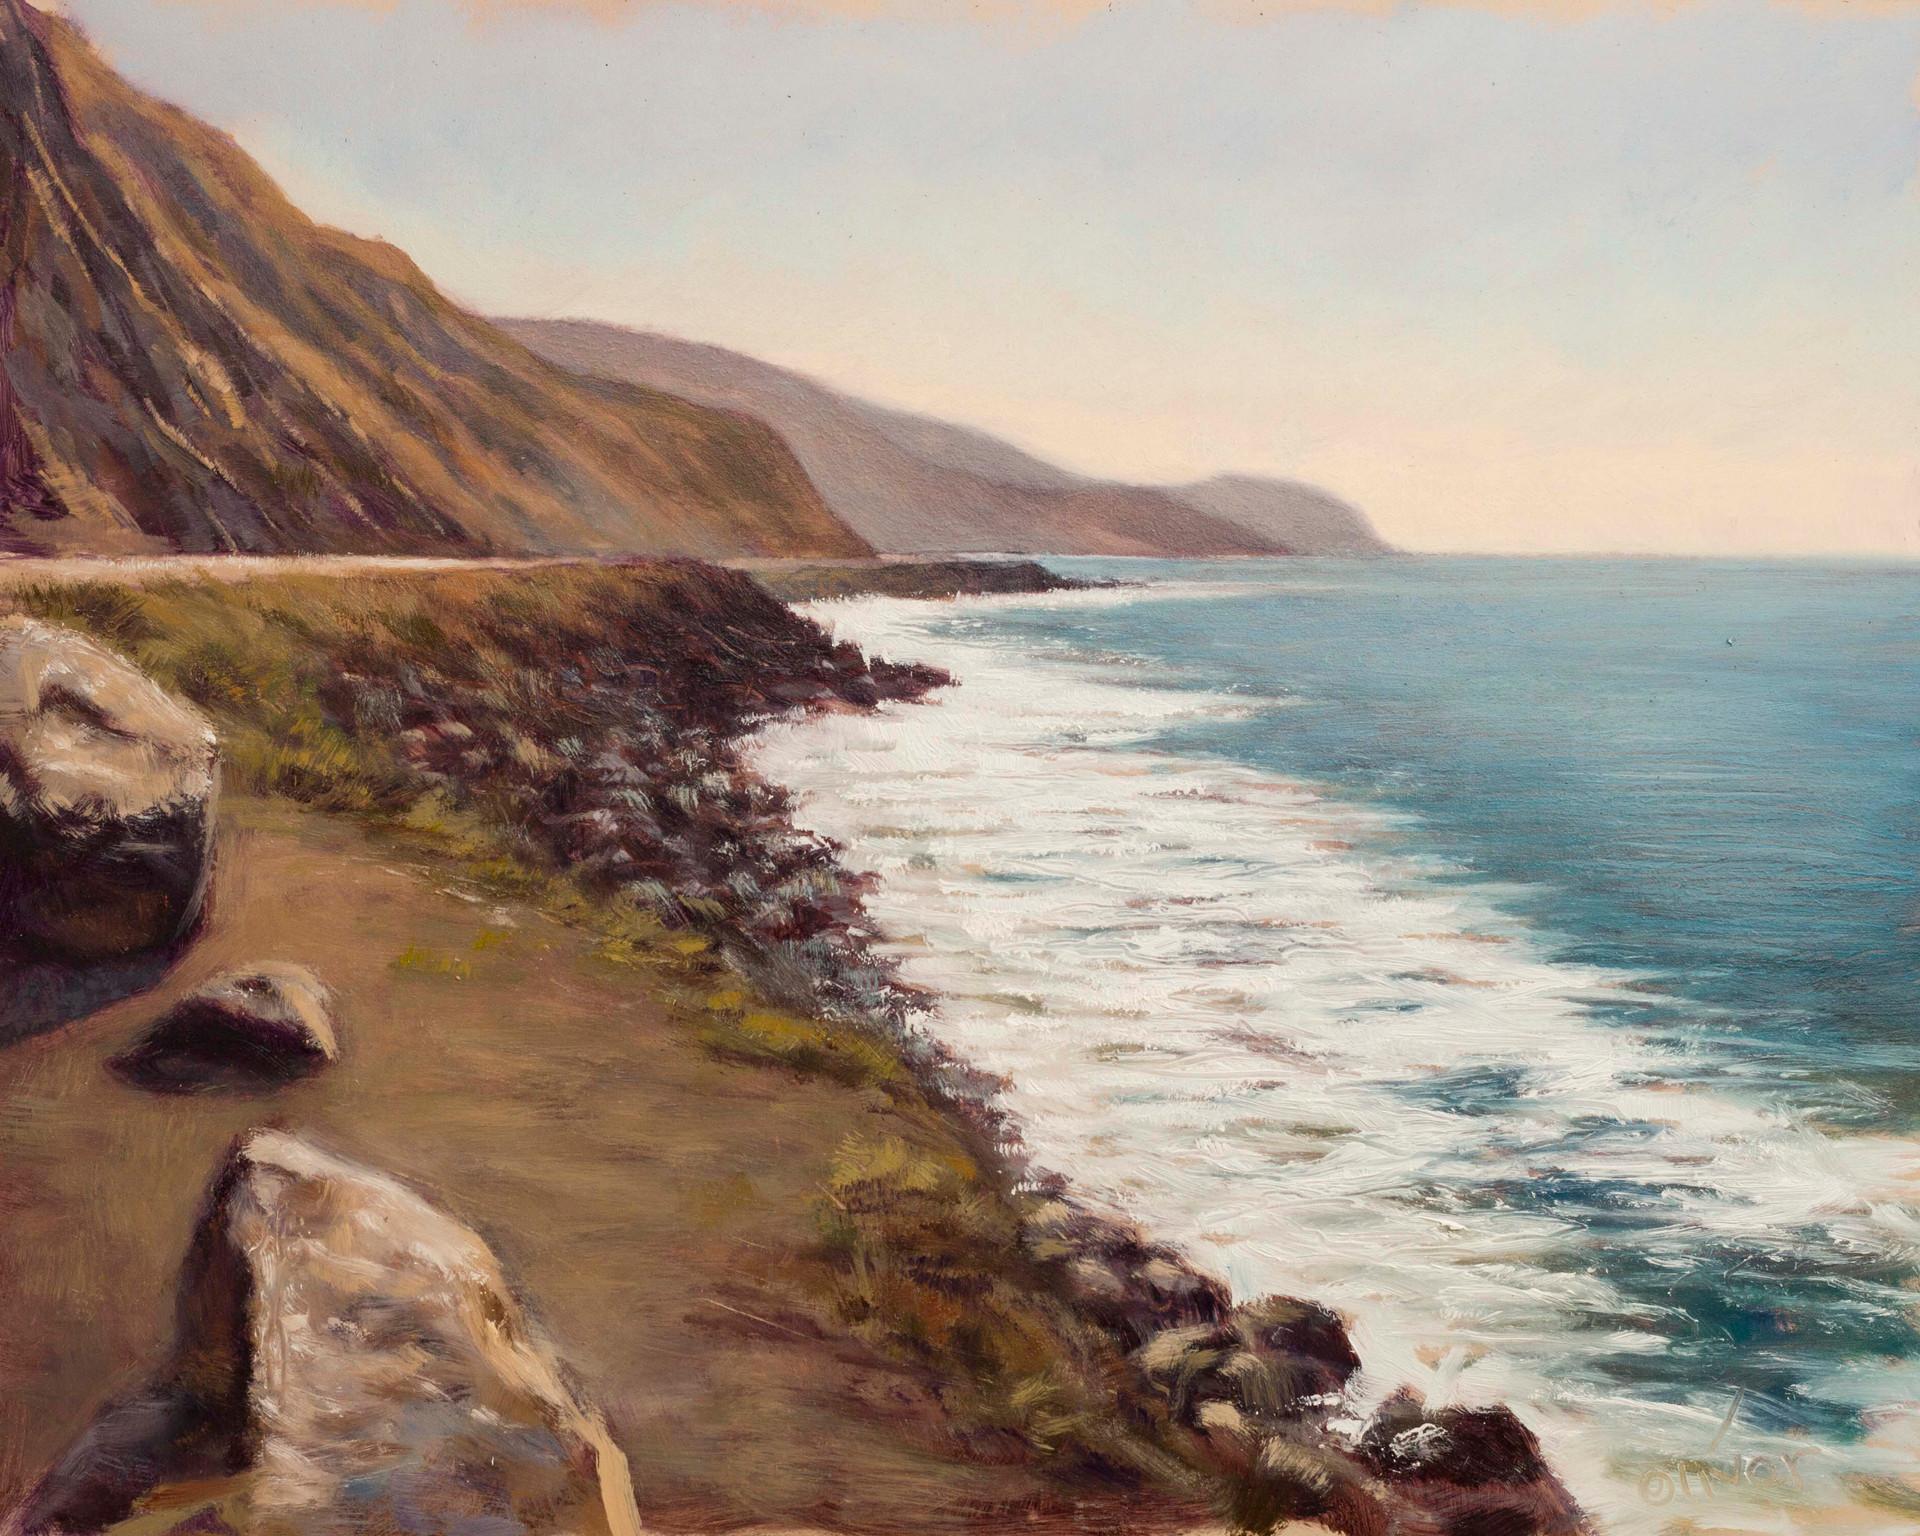 North Malibu coast looking south